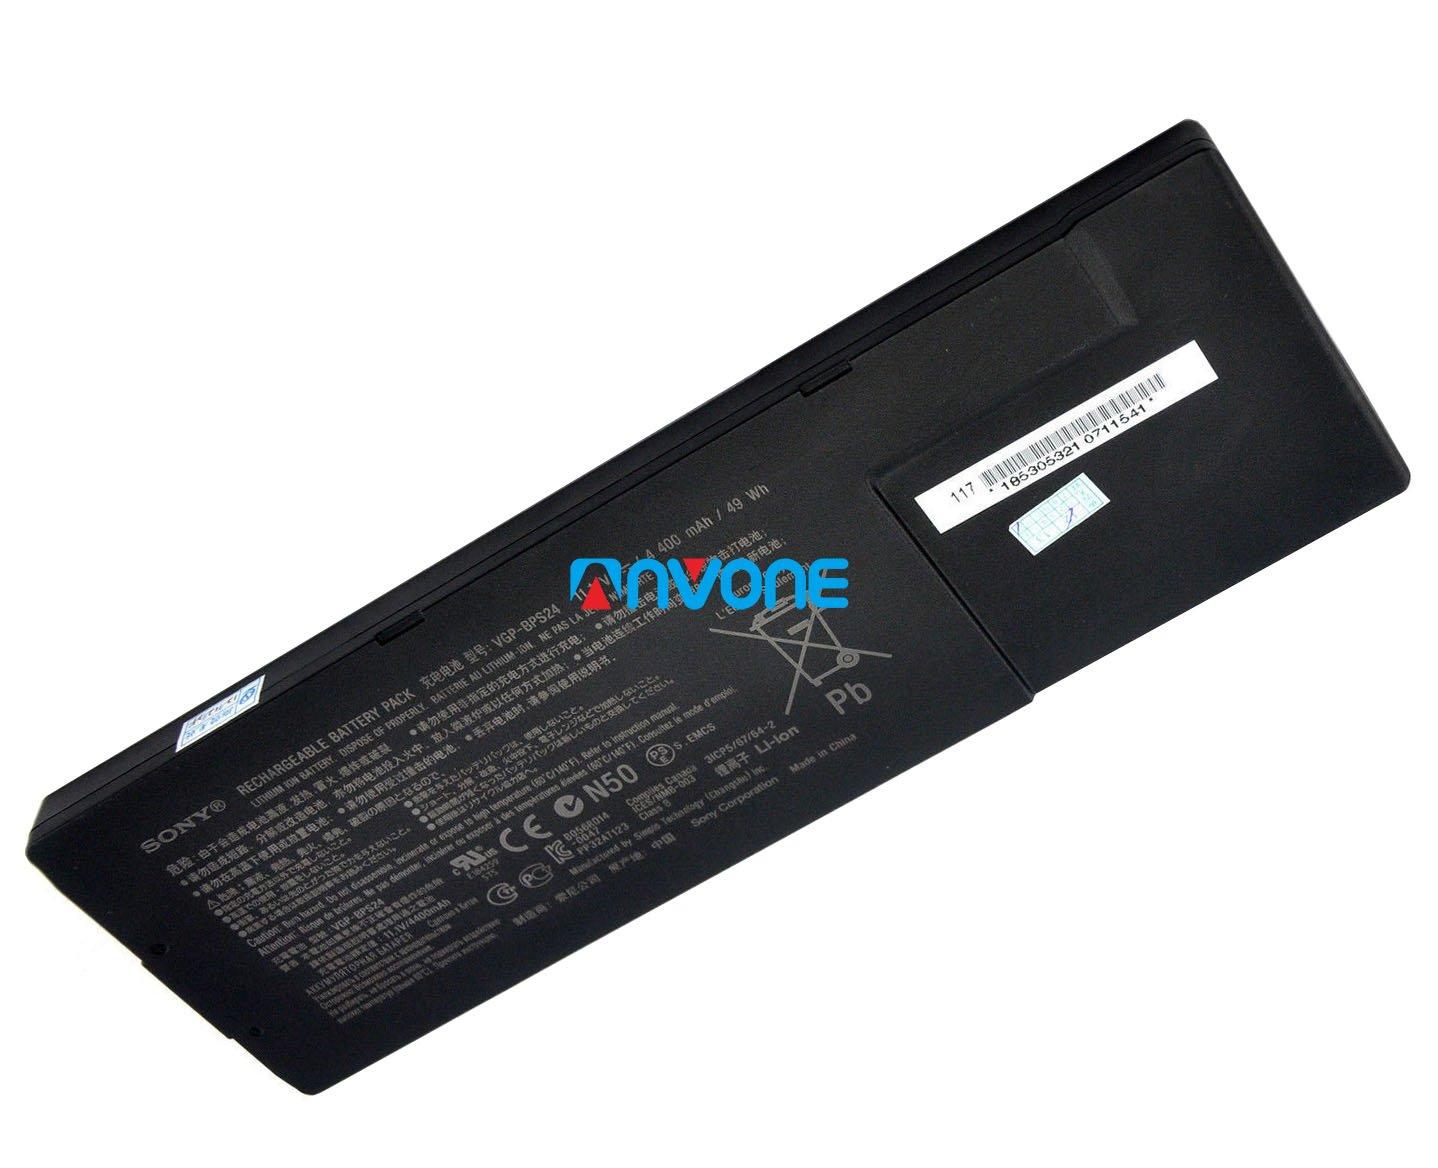 VGP-BPS24 Genuine Sony VAIO VPC-SD1S2C VPC-SD1S2C CN1 VPC-SD1S3C VPC-SD1S3C CN1 Battery